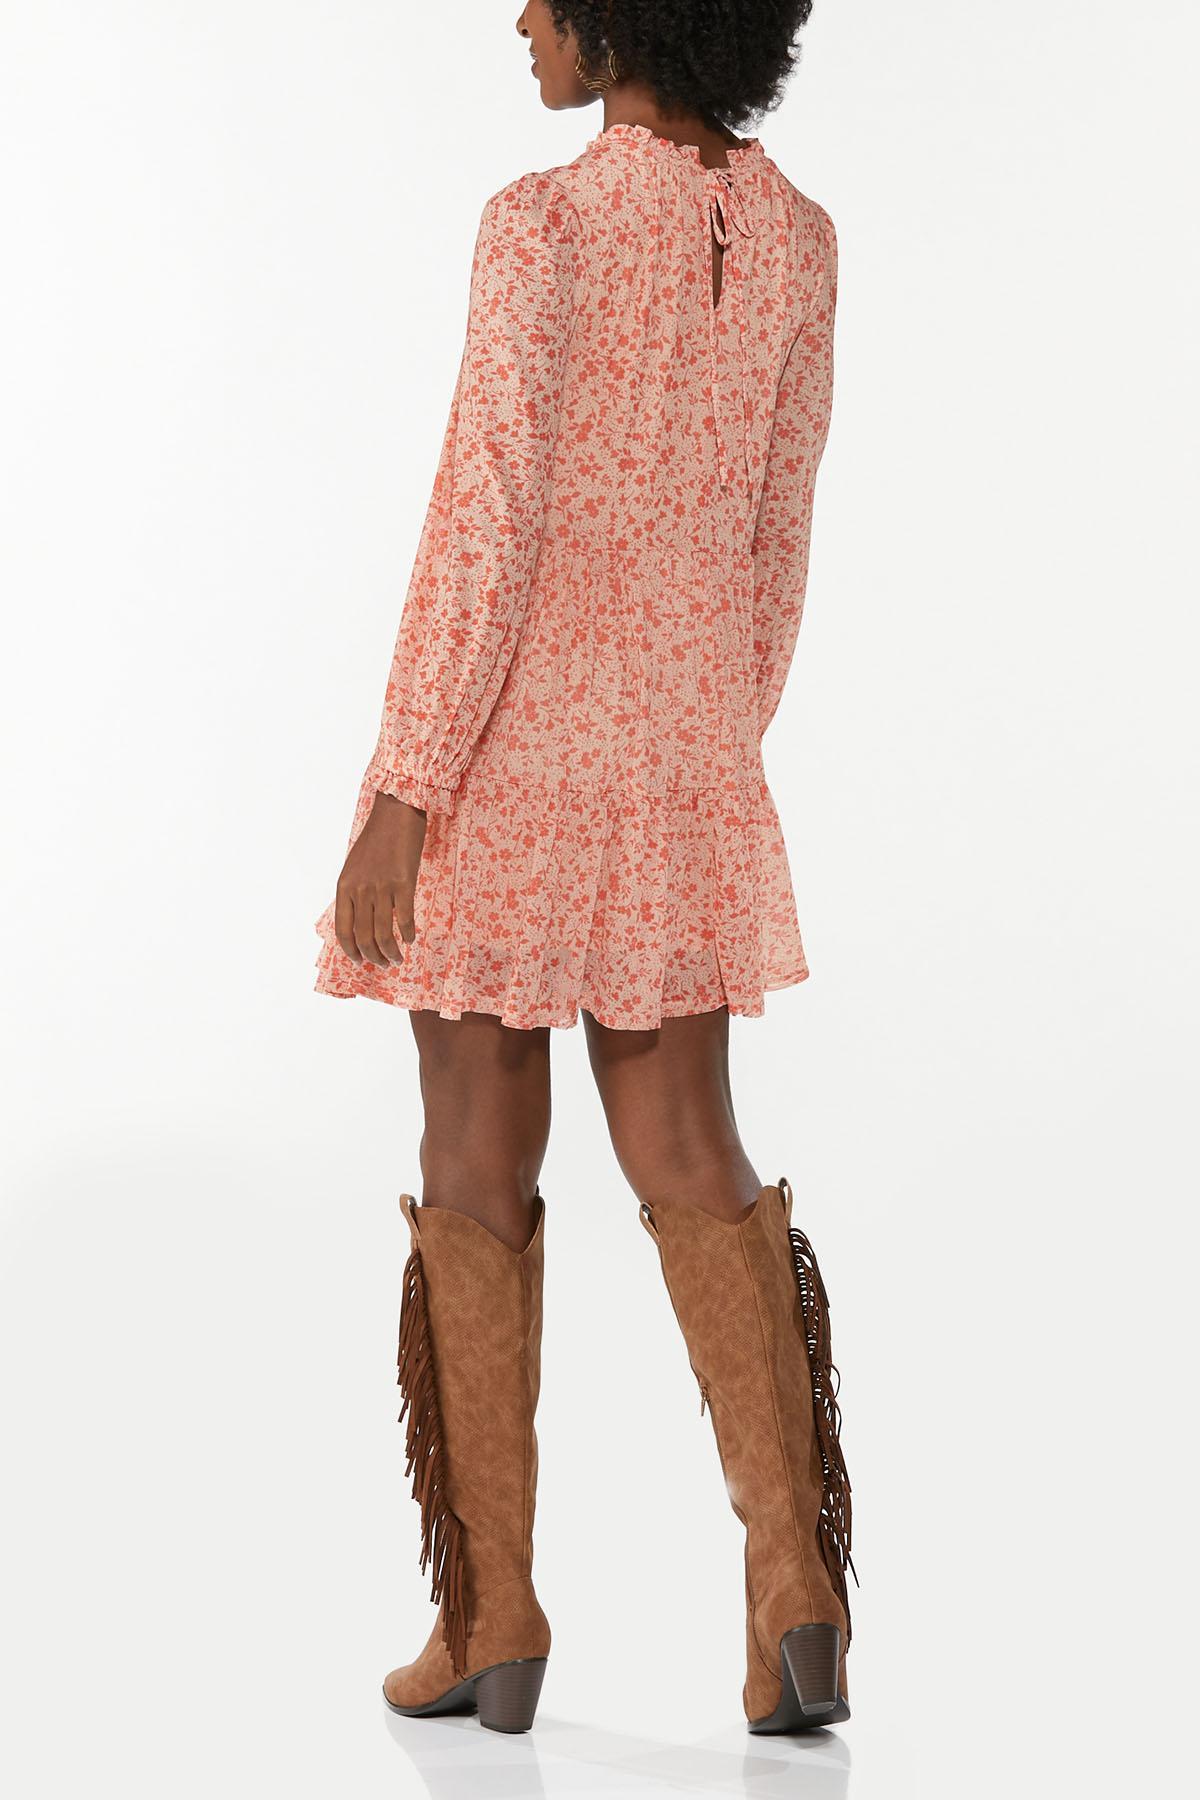 Floral Mesh Babydoll Dress (Item #44697641)